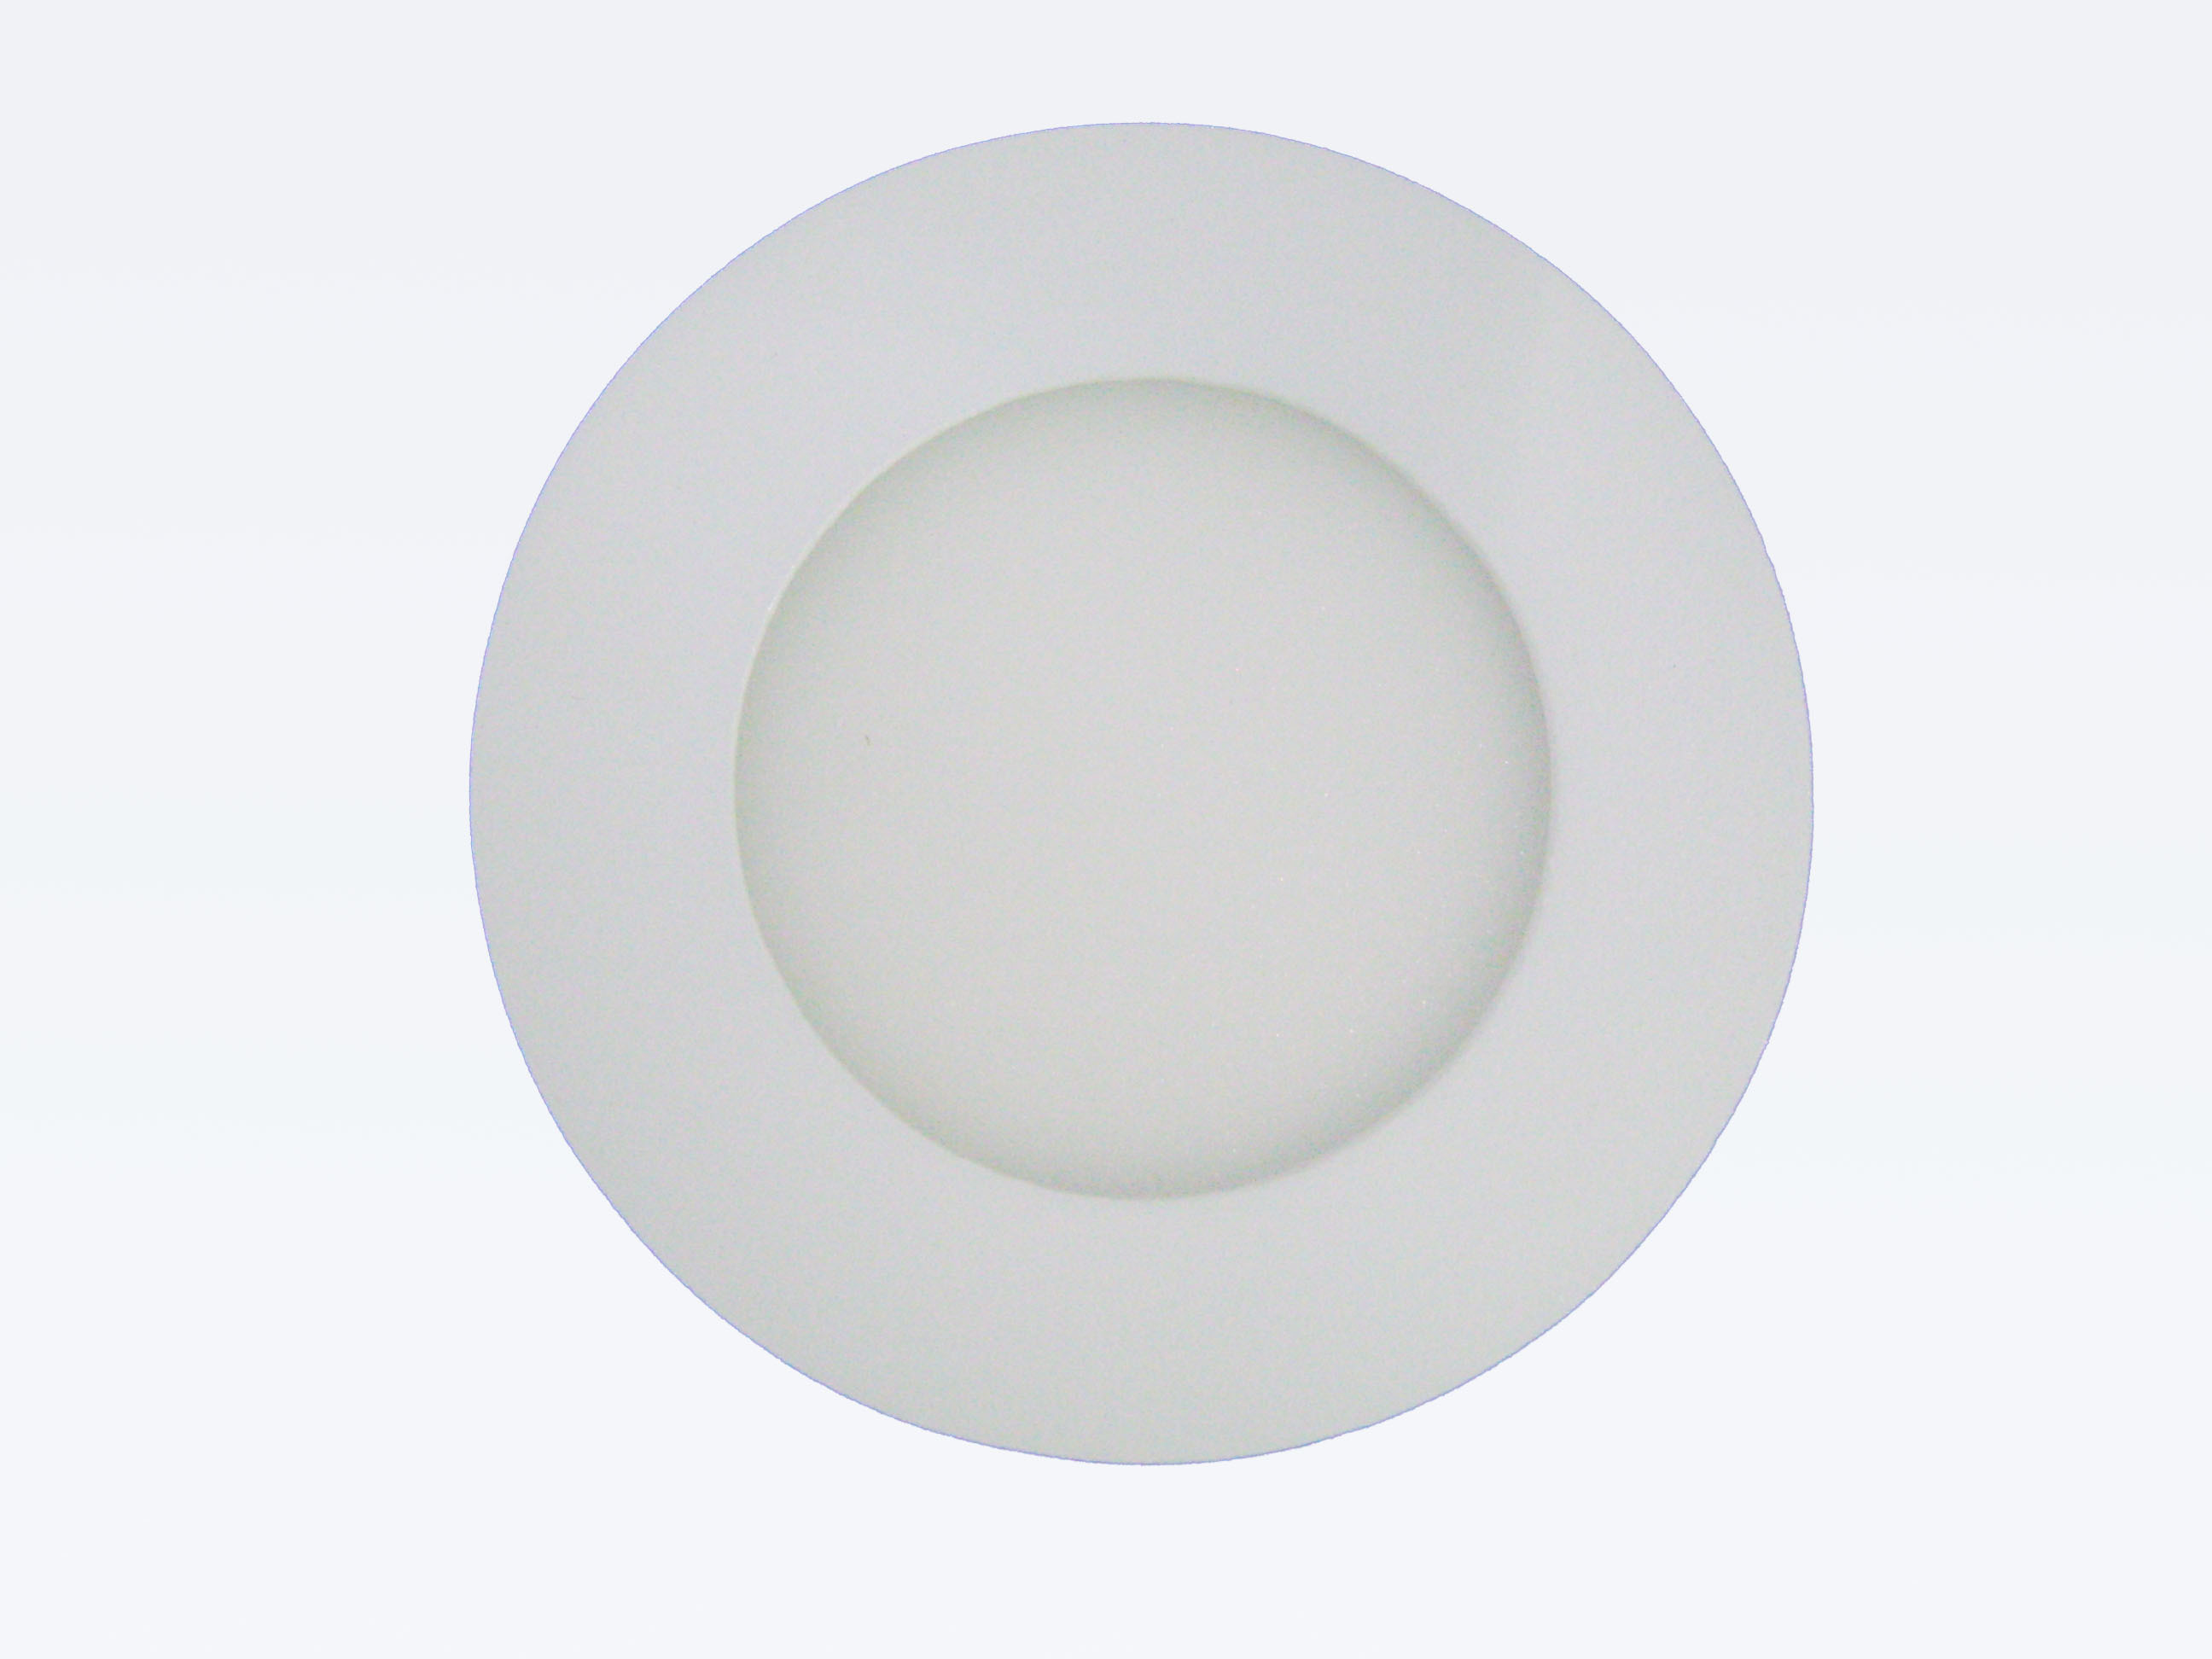 3W Round Panel Light